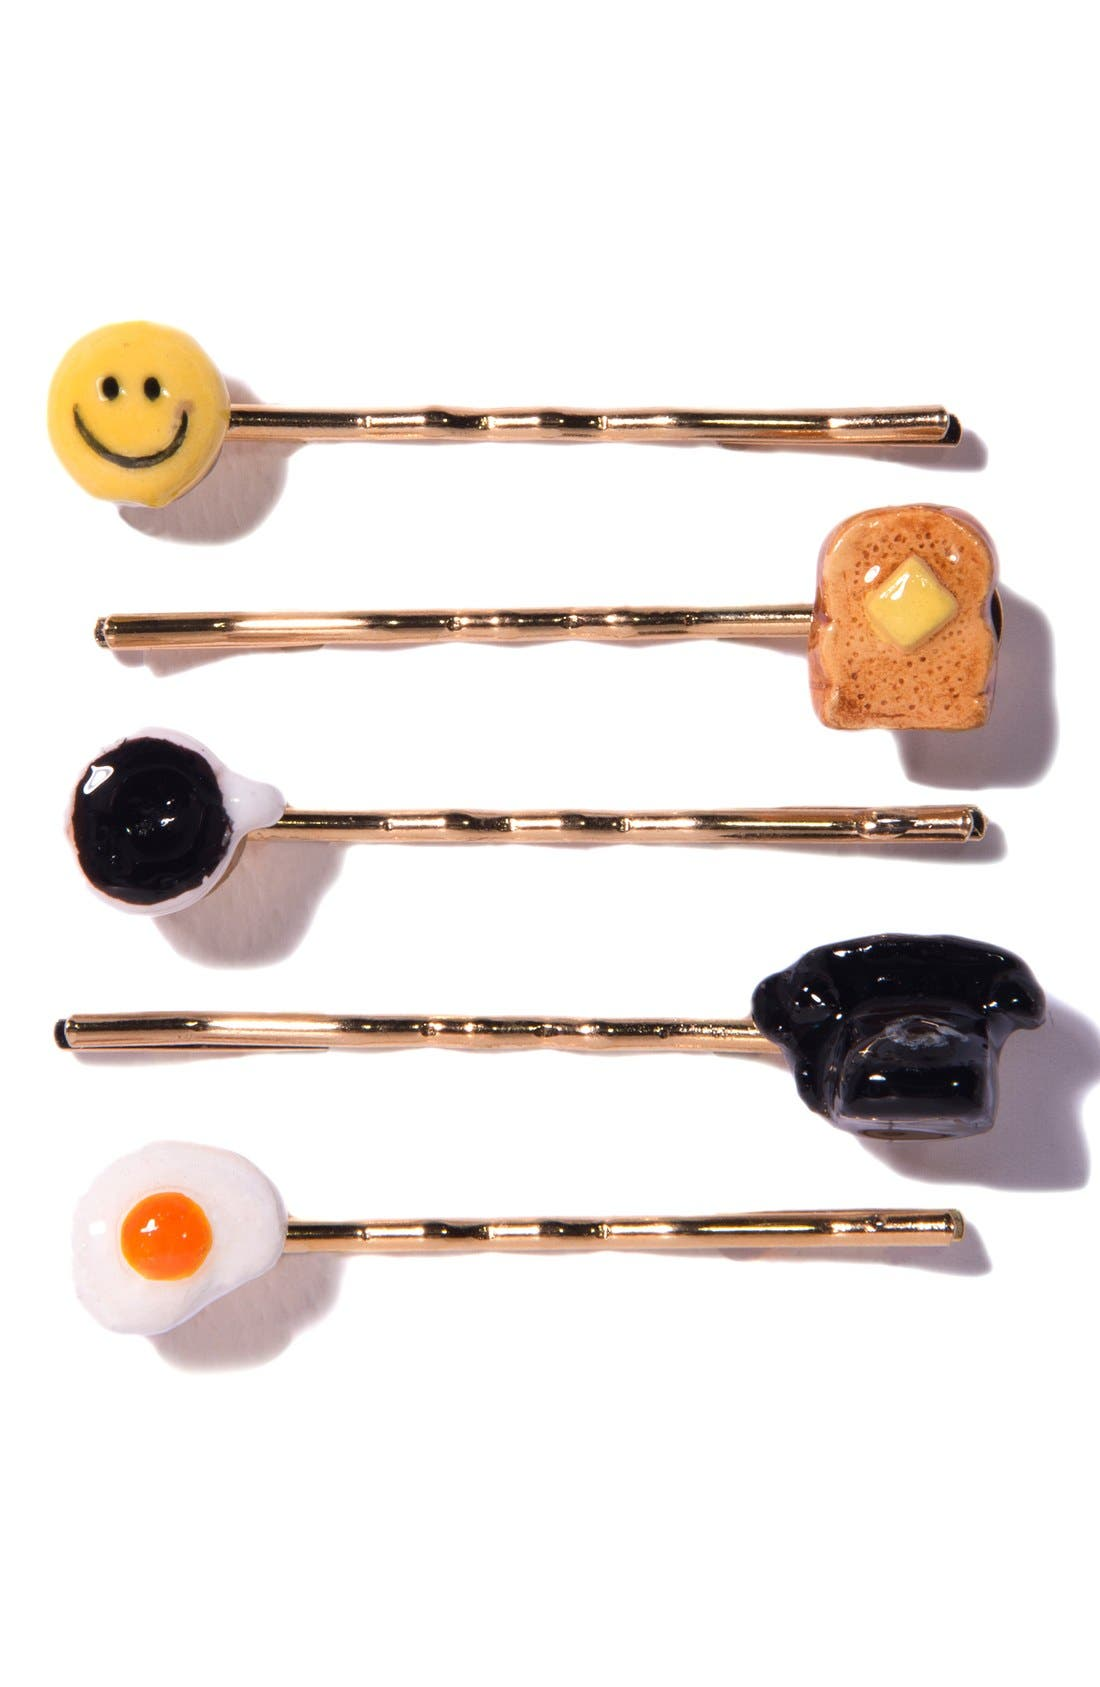 Alternate Image 1 Selected - Venessa Arizaga 'Brunch Time' Bobby Pins (Set of 5)